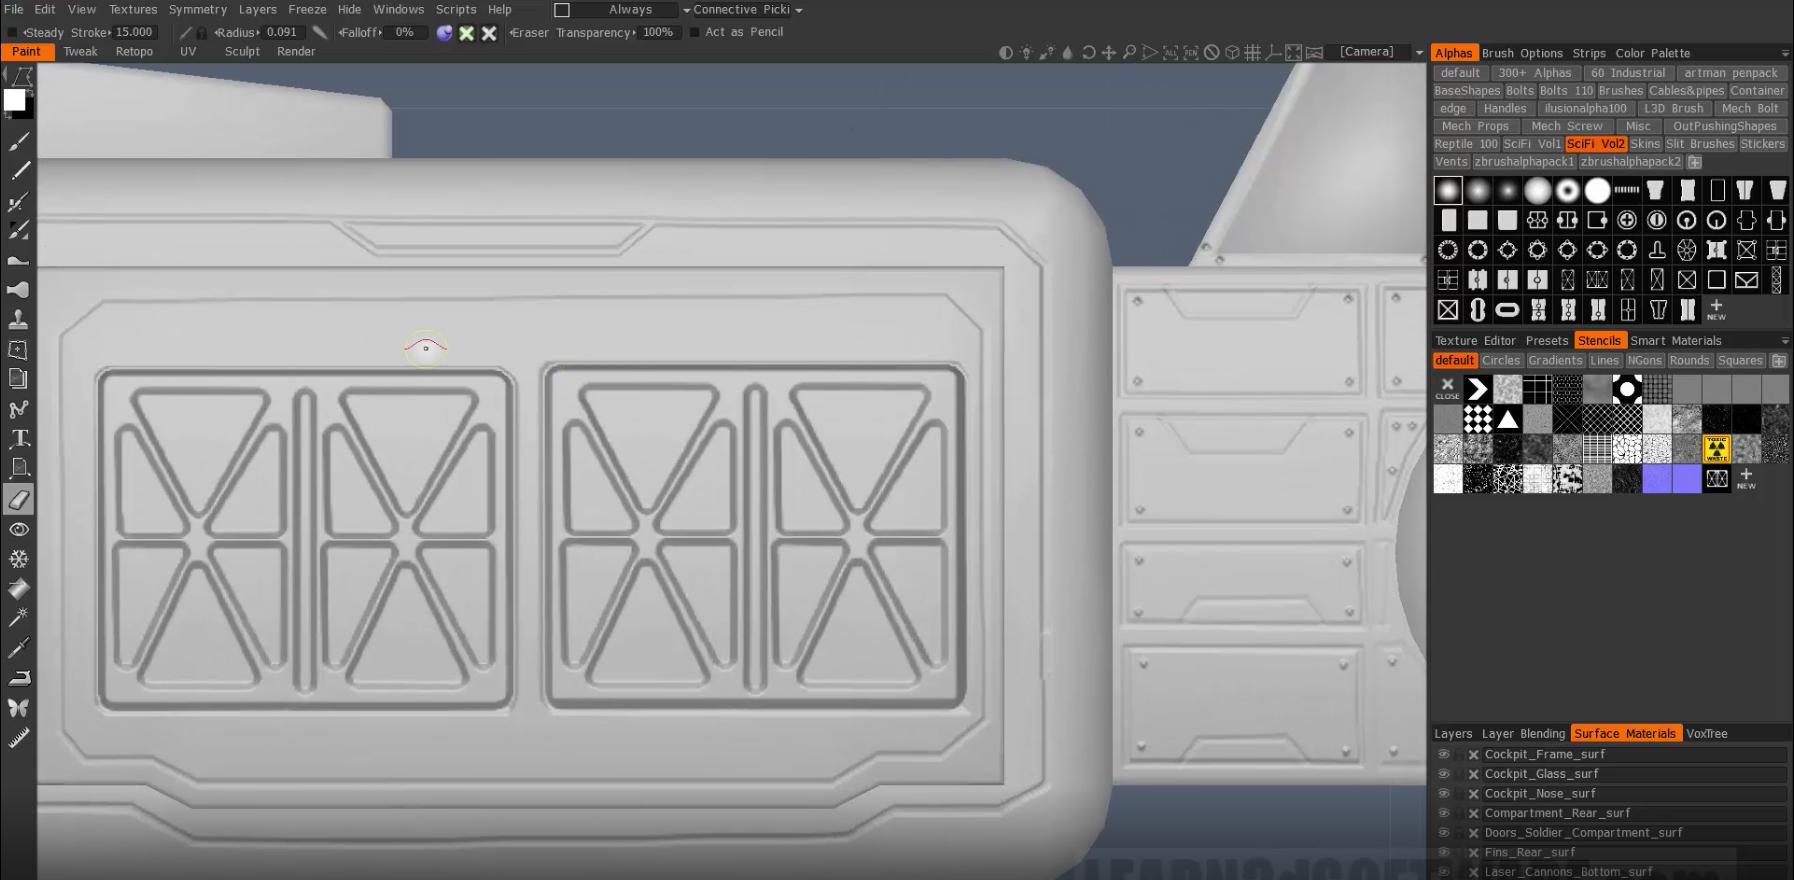 3D Coat 4 7- Sci-Fi Detailing II- PBR & Alpha Brushes (Bonus: 100